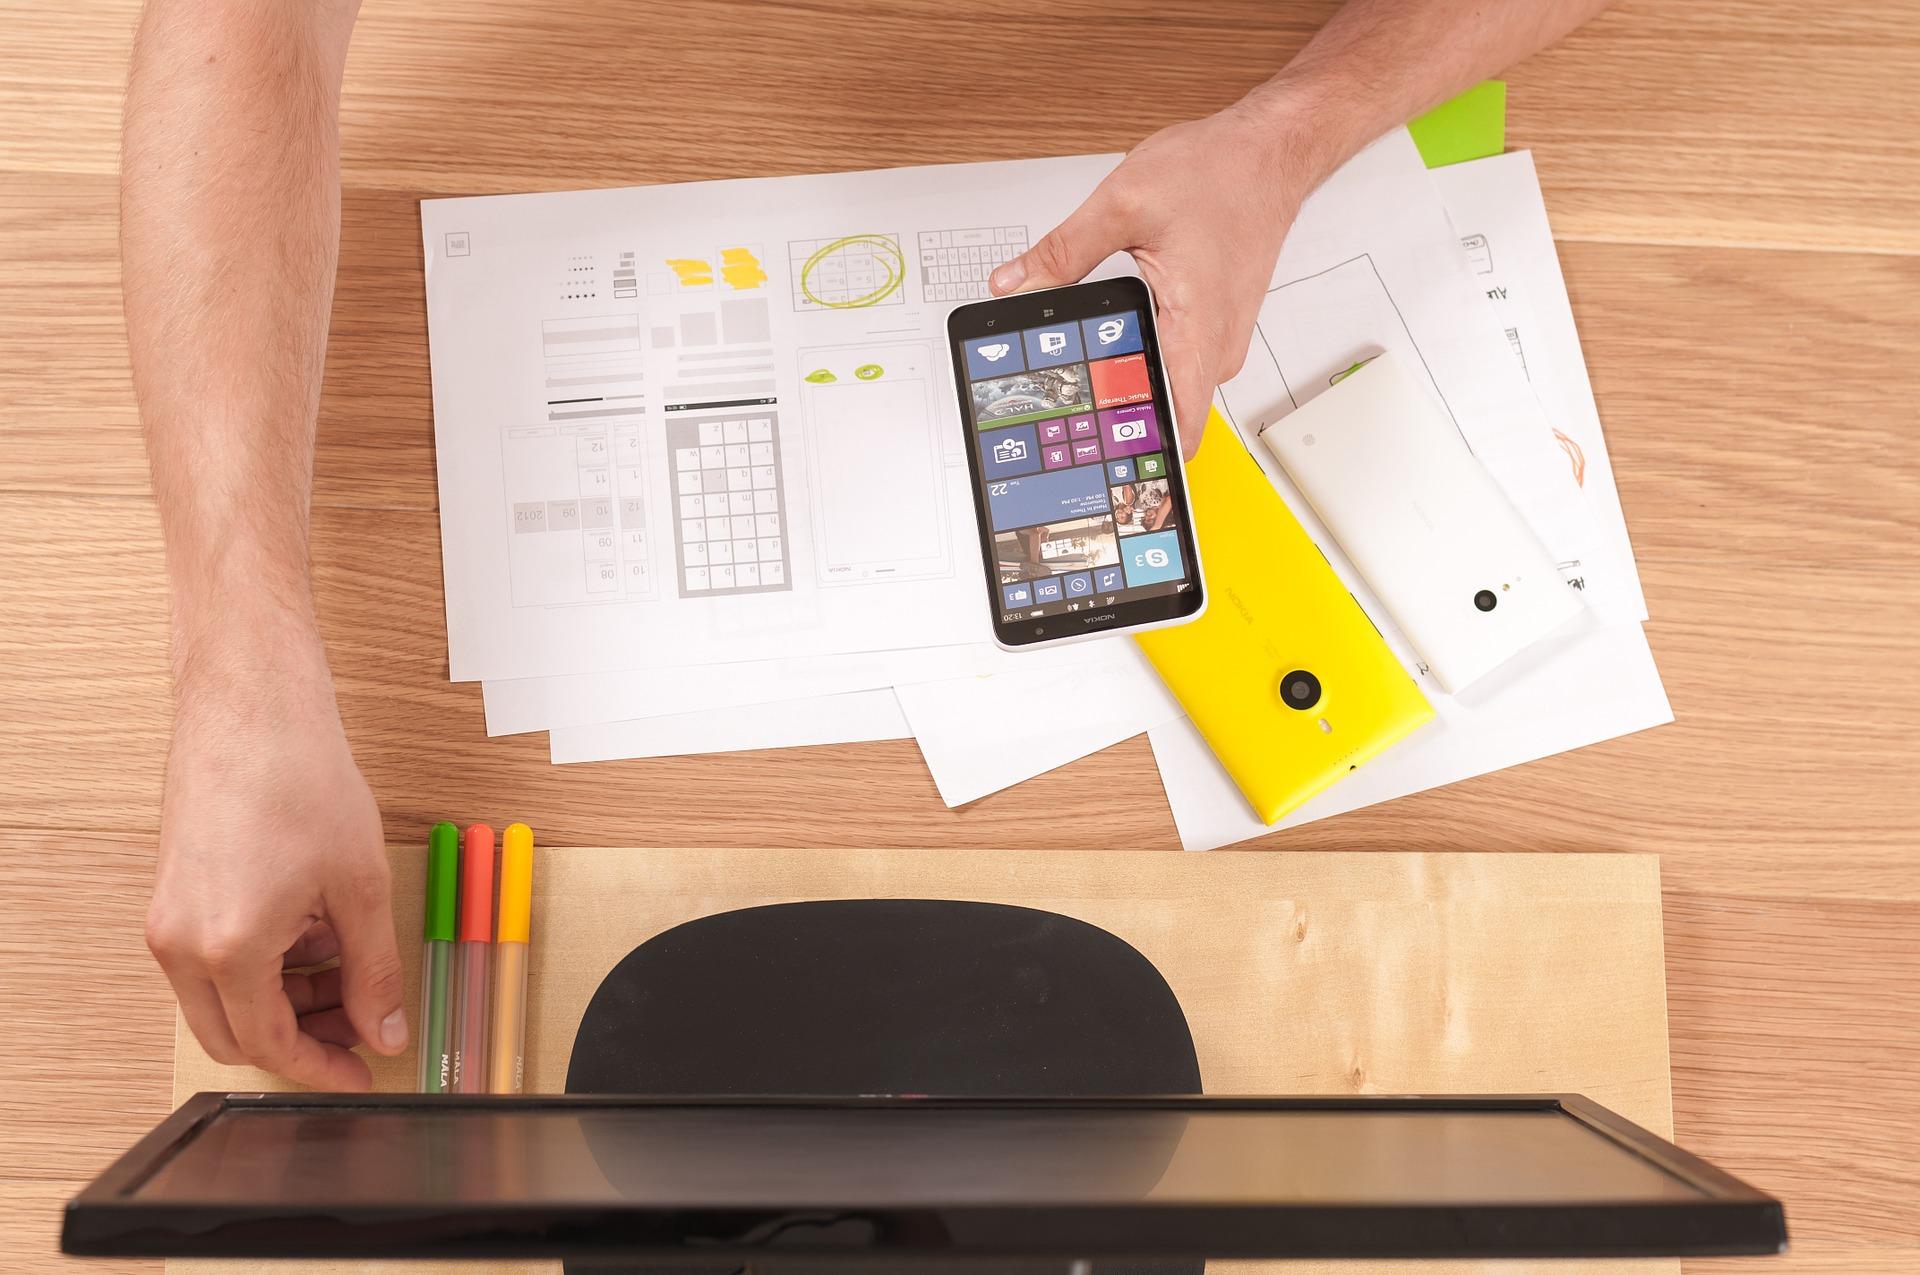 Diseñando una interfaz móvil